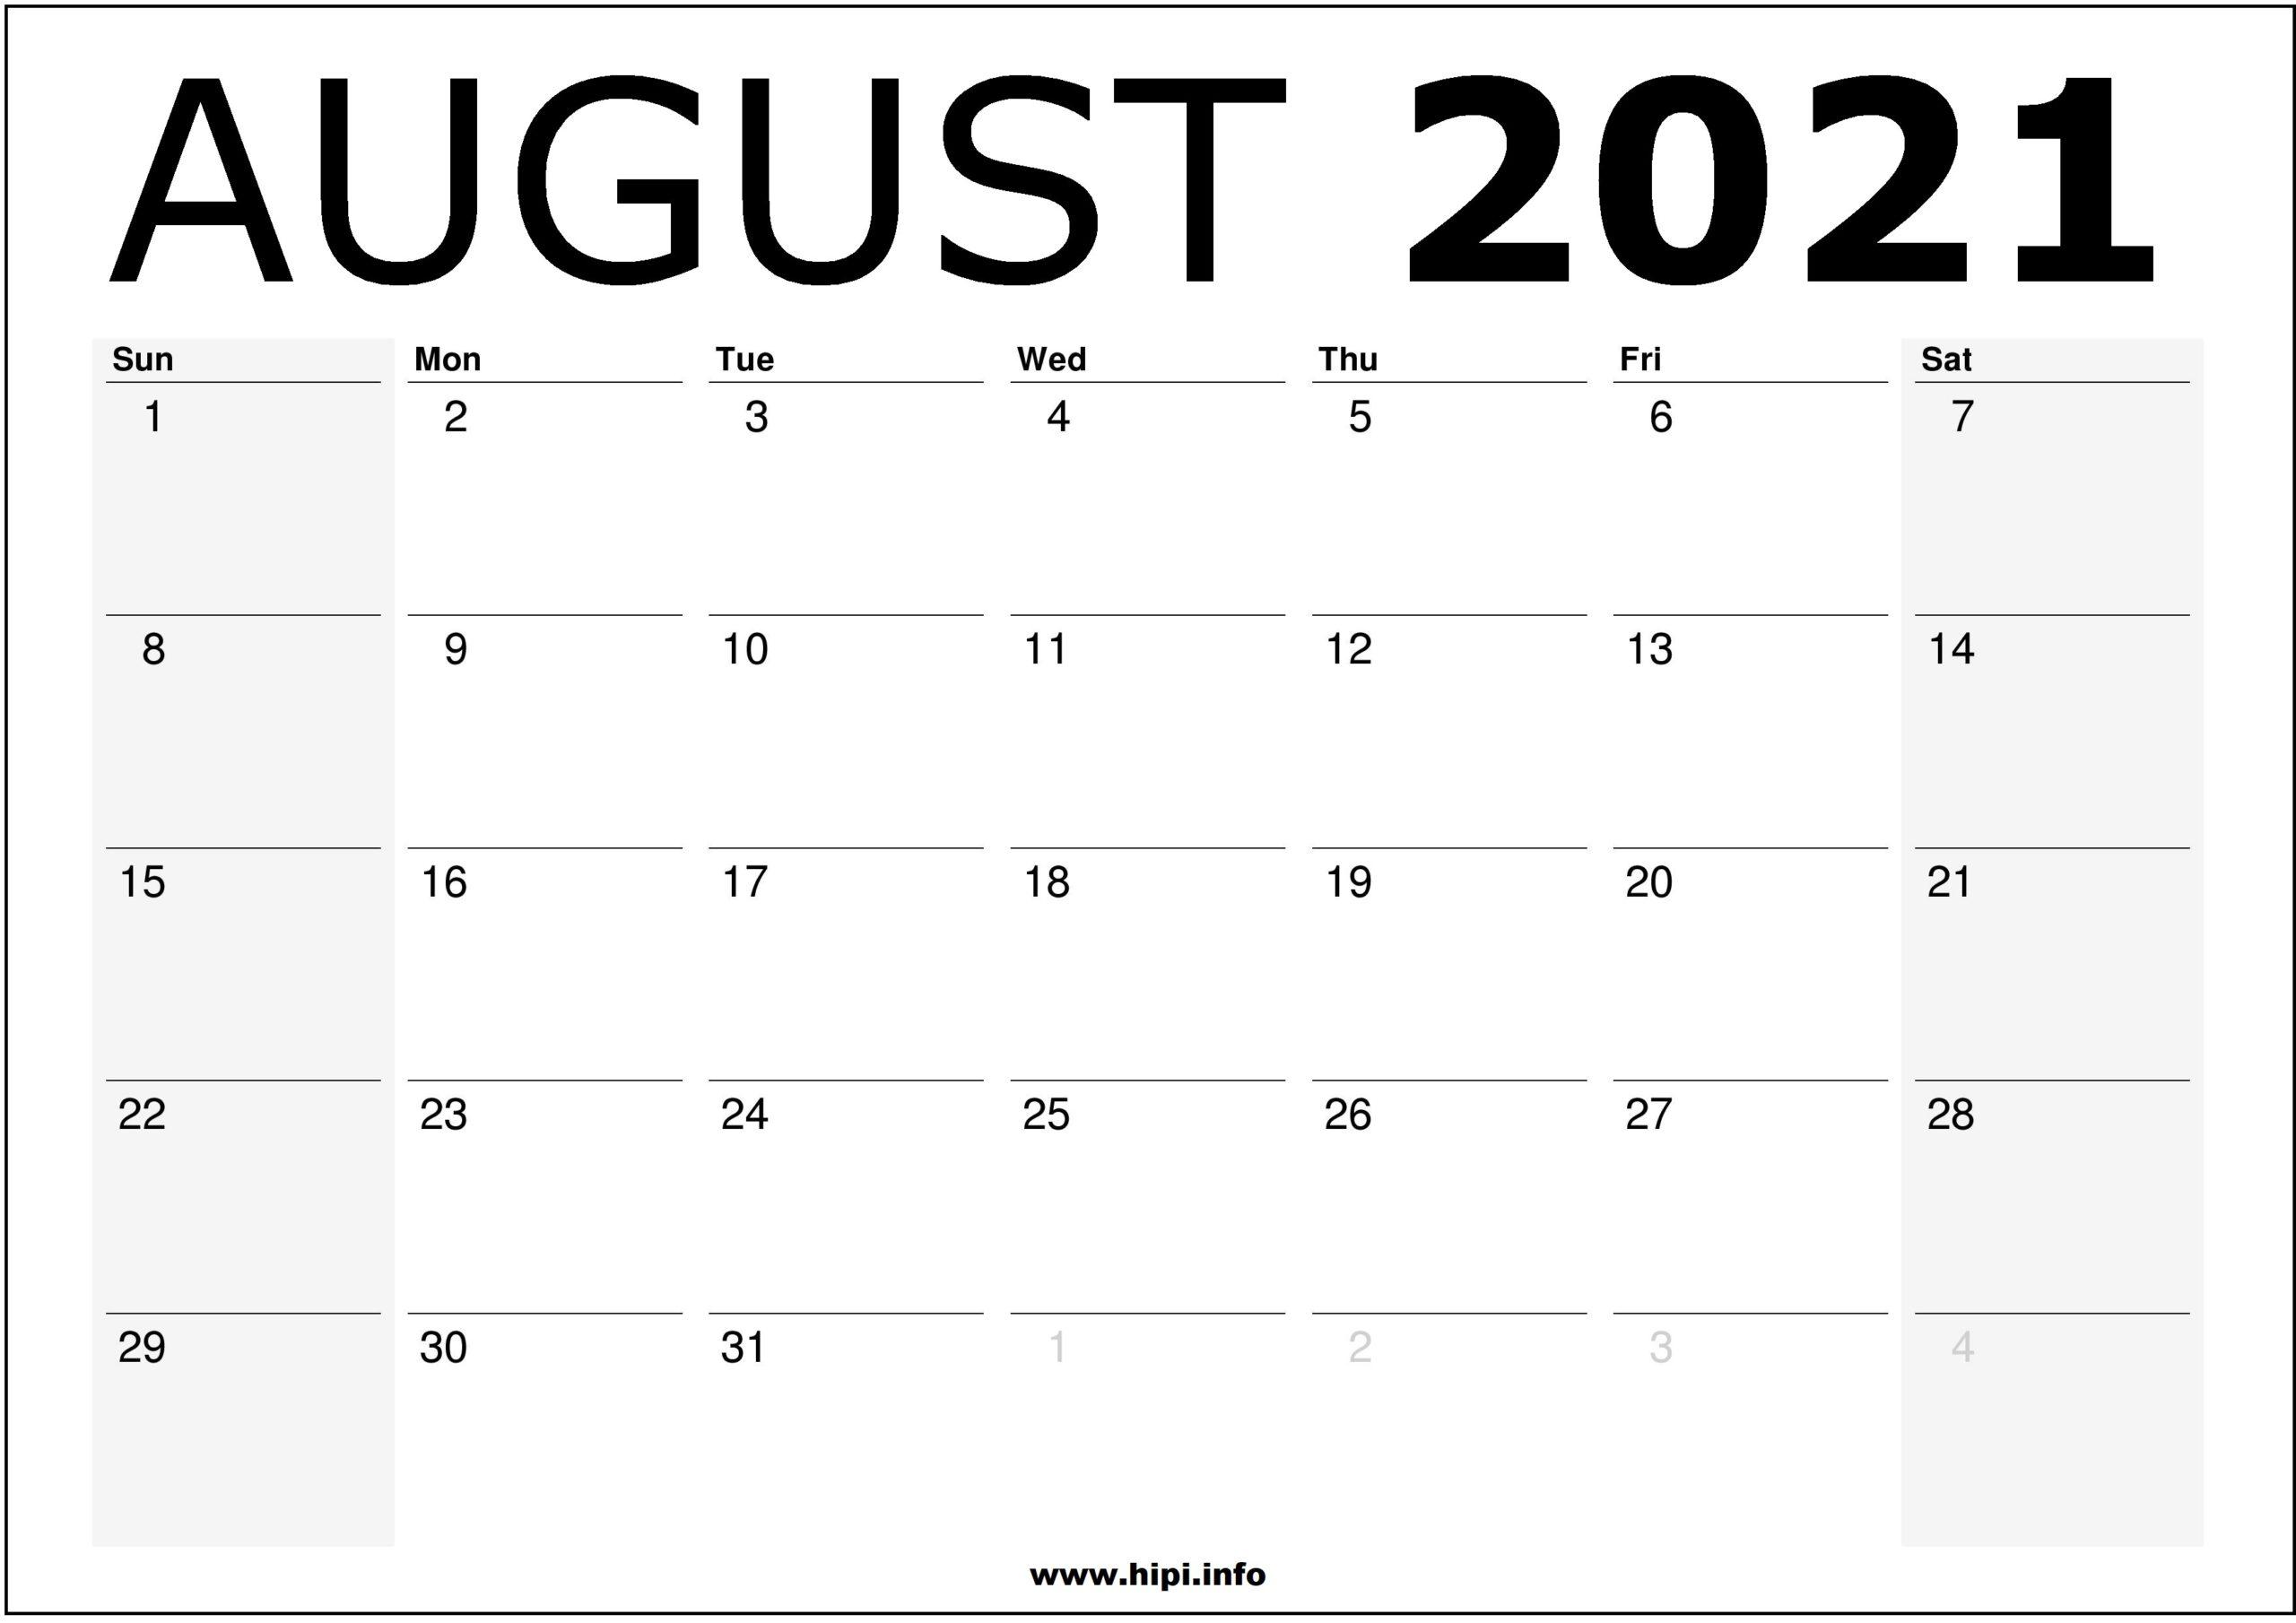 August 2021 Calendar Printable  Monthly Calendar Free inside August 2021 Calendar Print